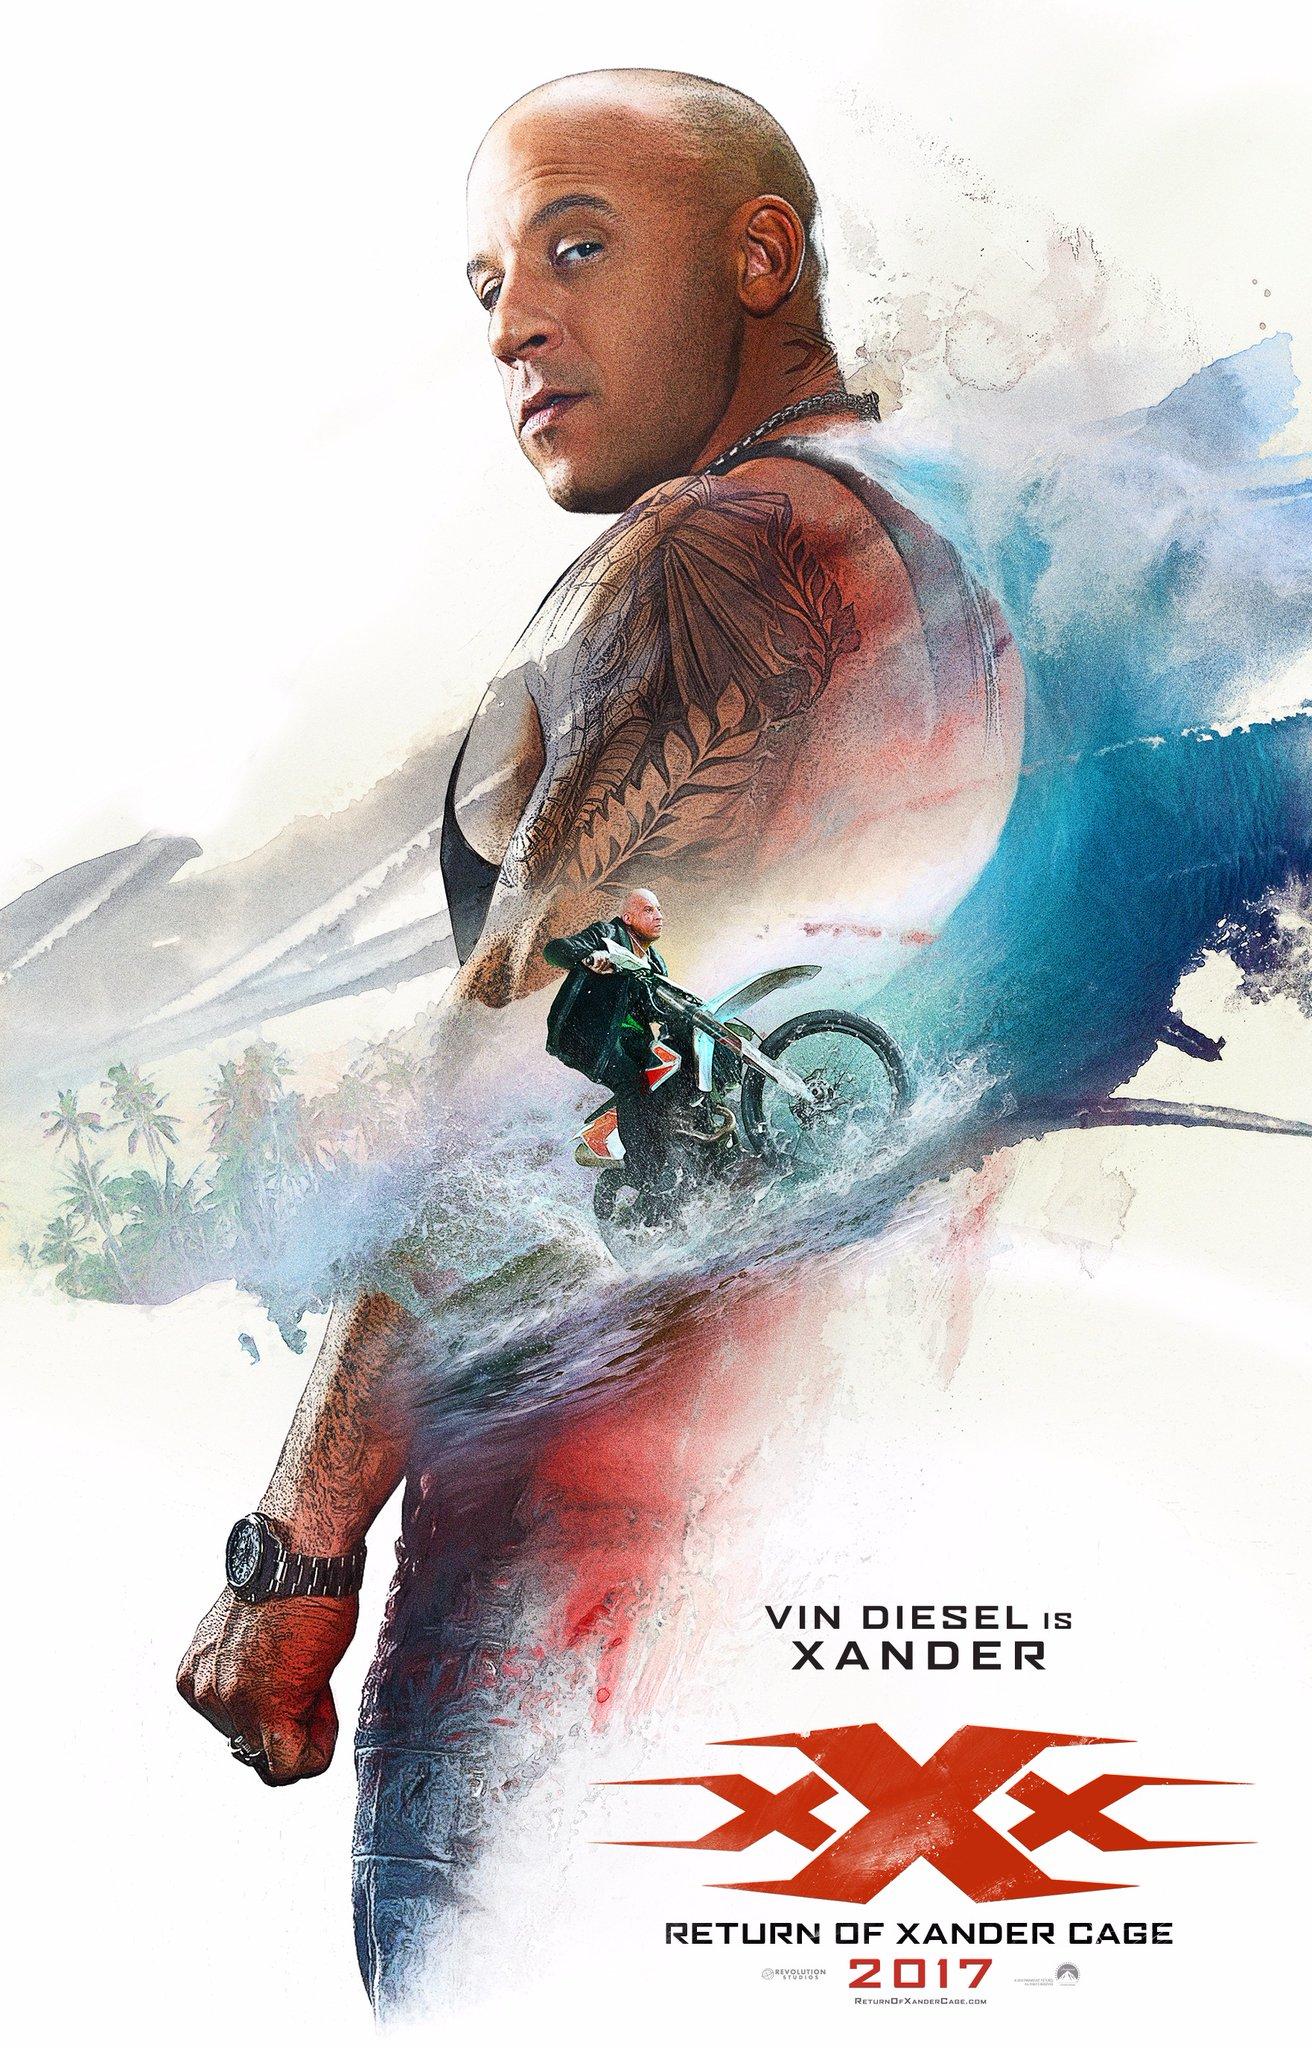 phim chiếu rạp Paramount - XXX - elle vietnam